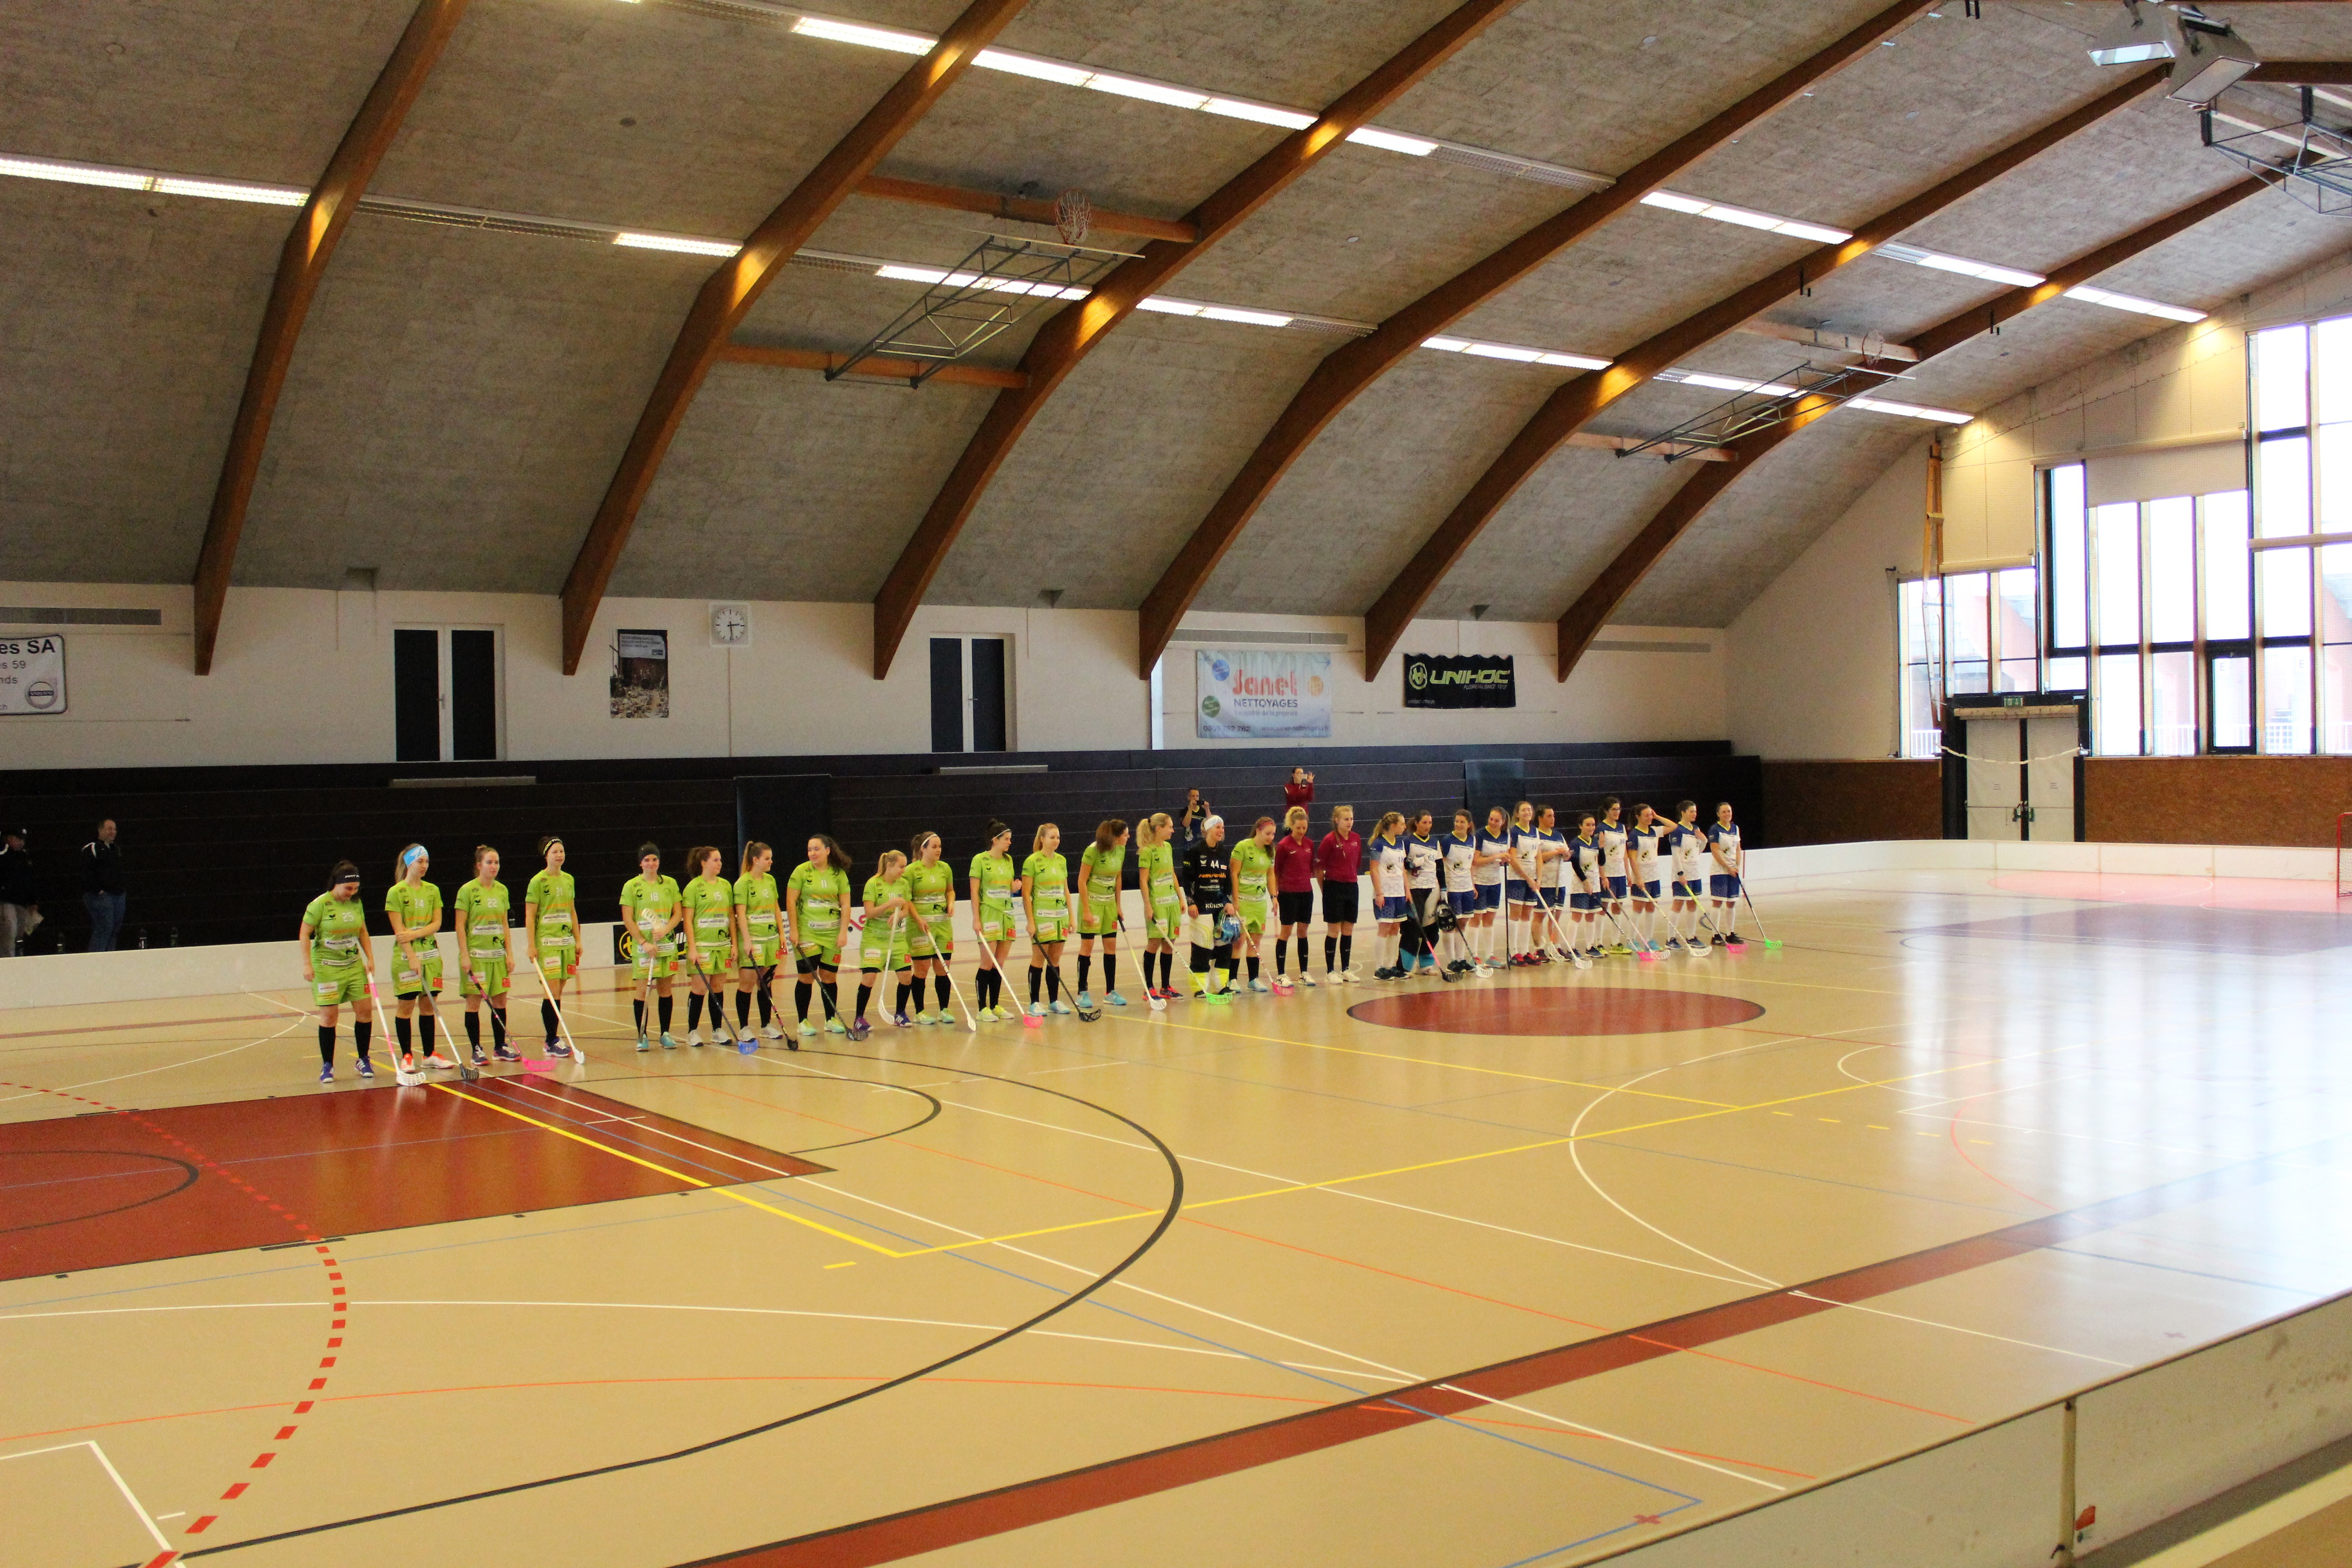 2019.01.12_1. Liga vs. La Chaux-de-Fonds